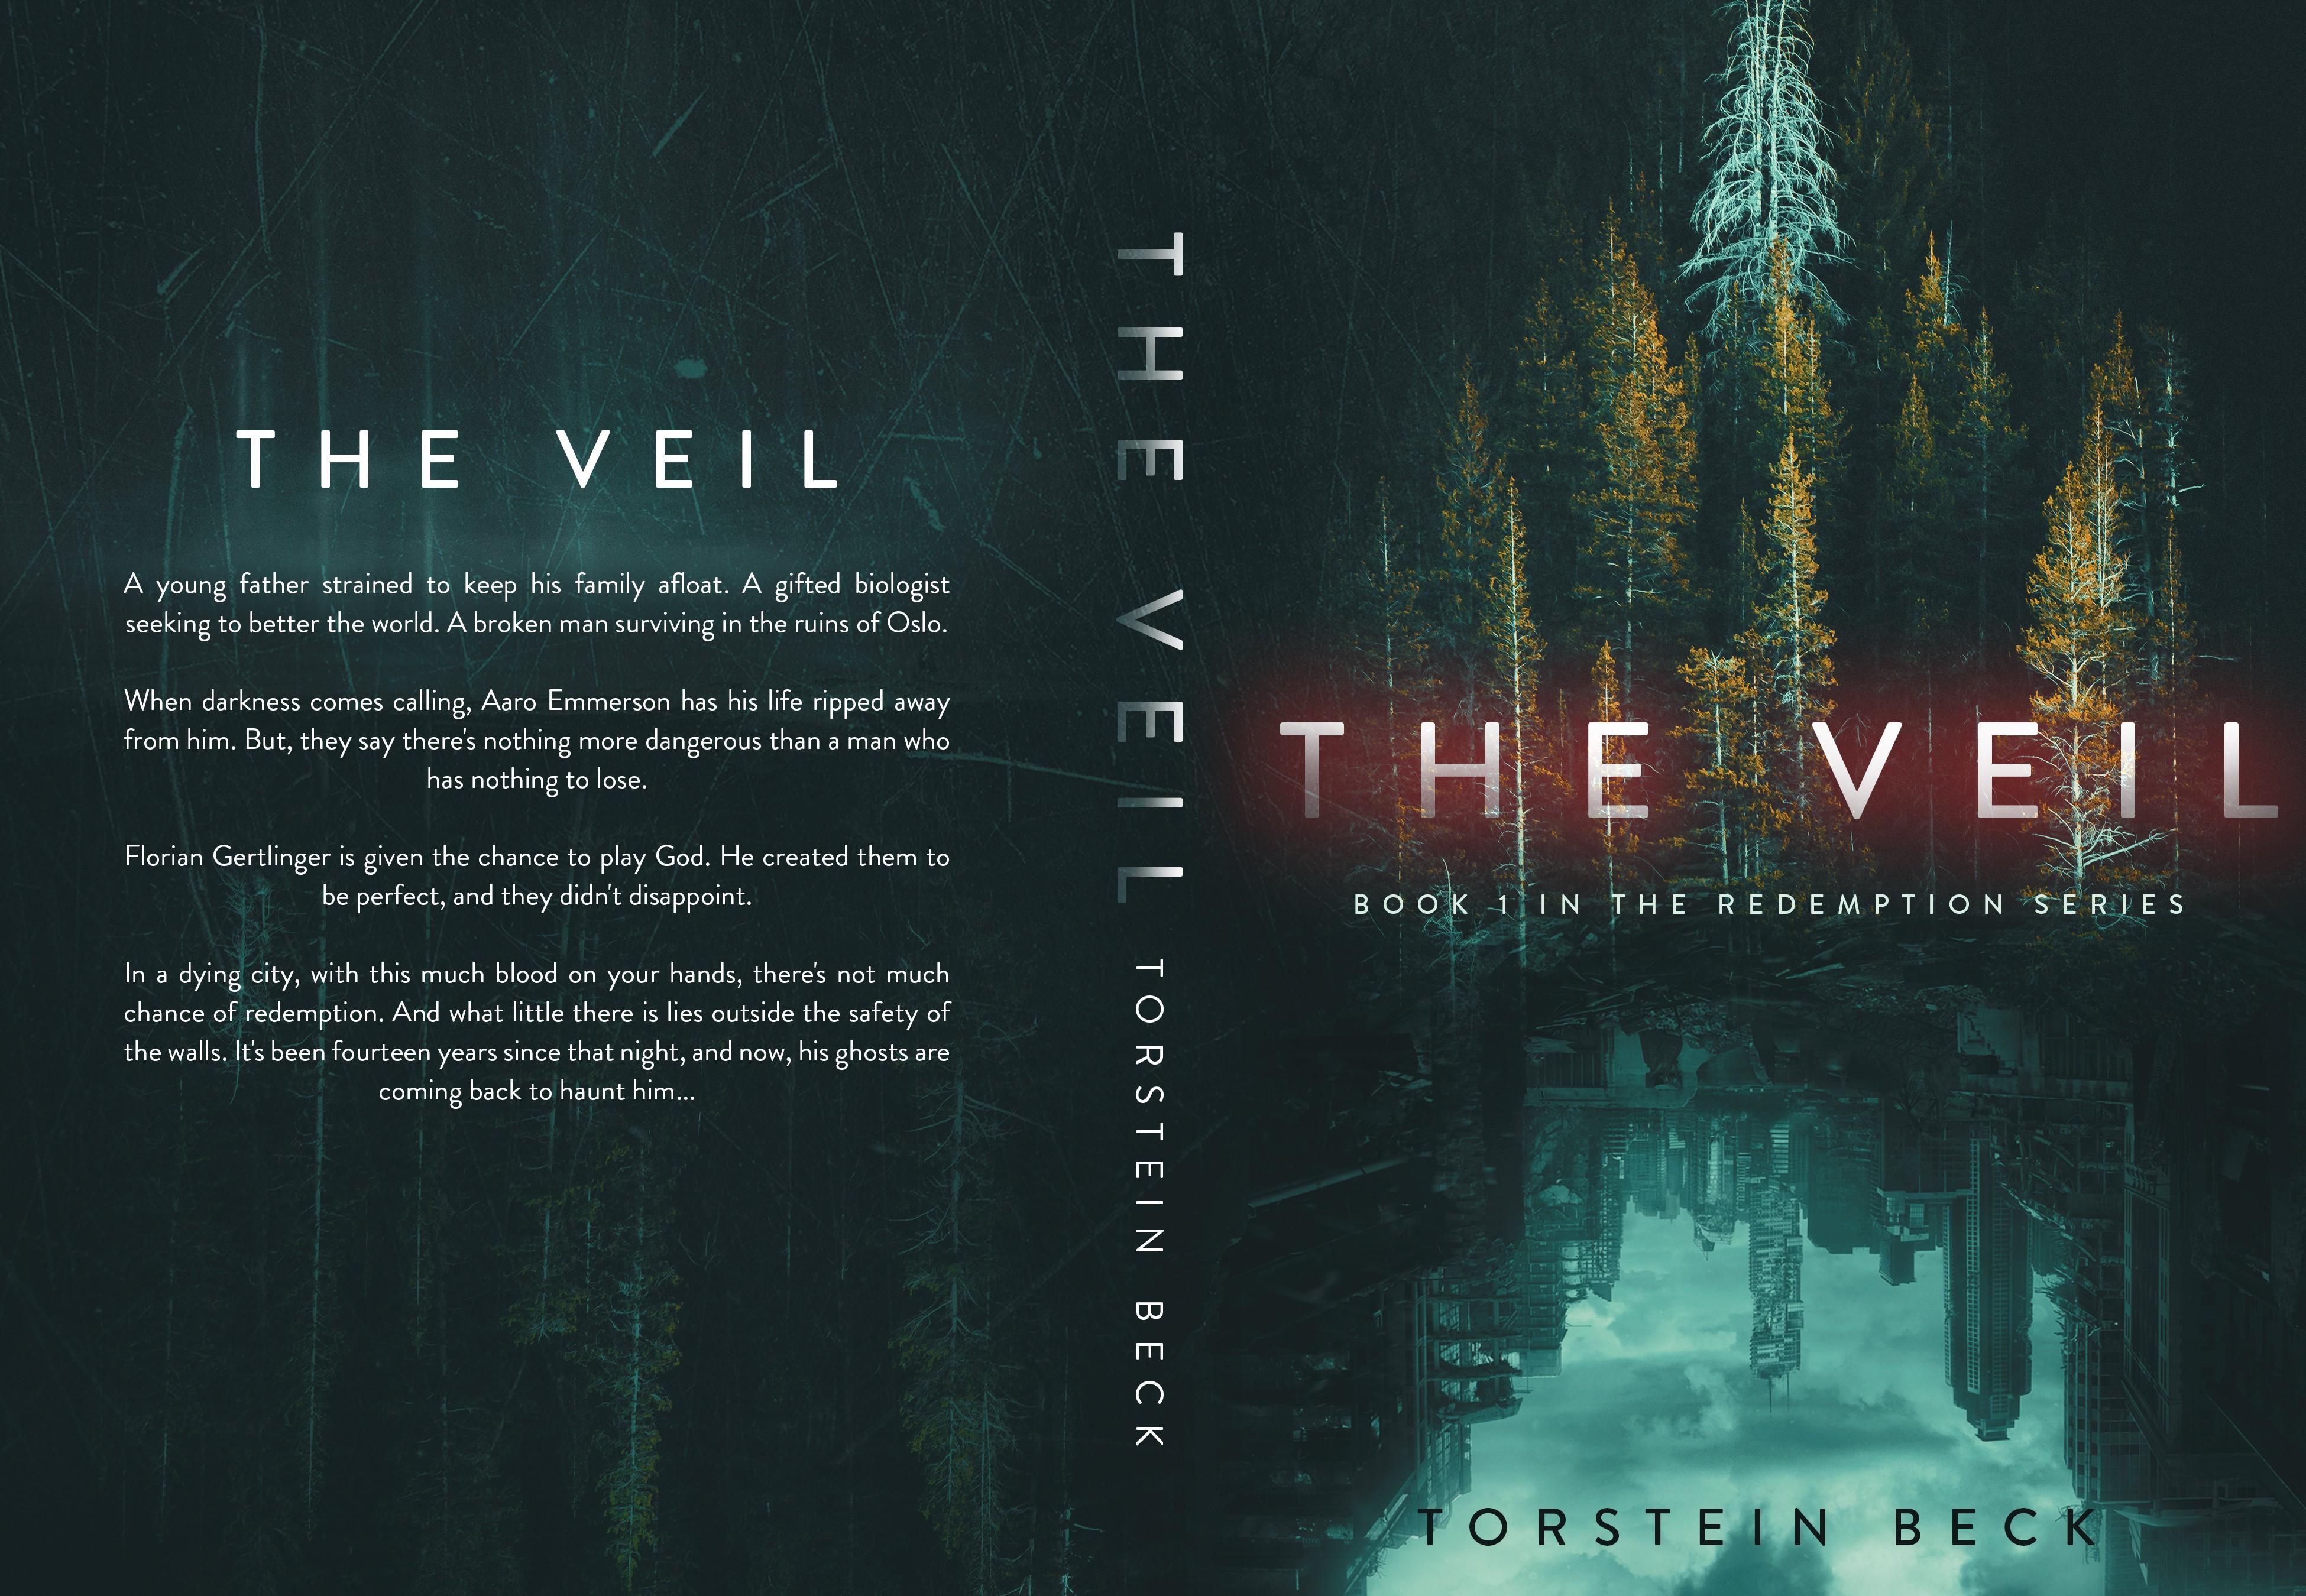 Design a book cover for a dystopian bio-punk sci-fi thriller